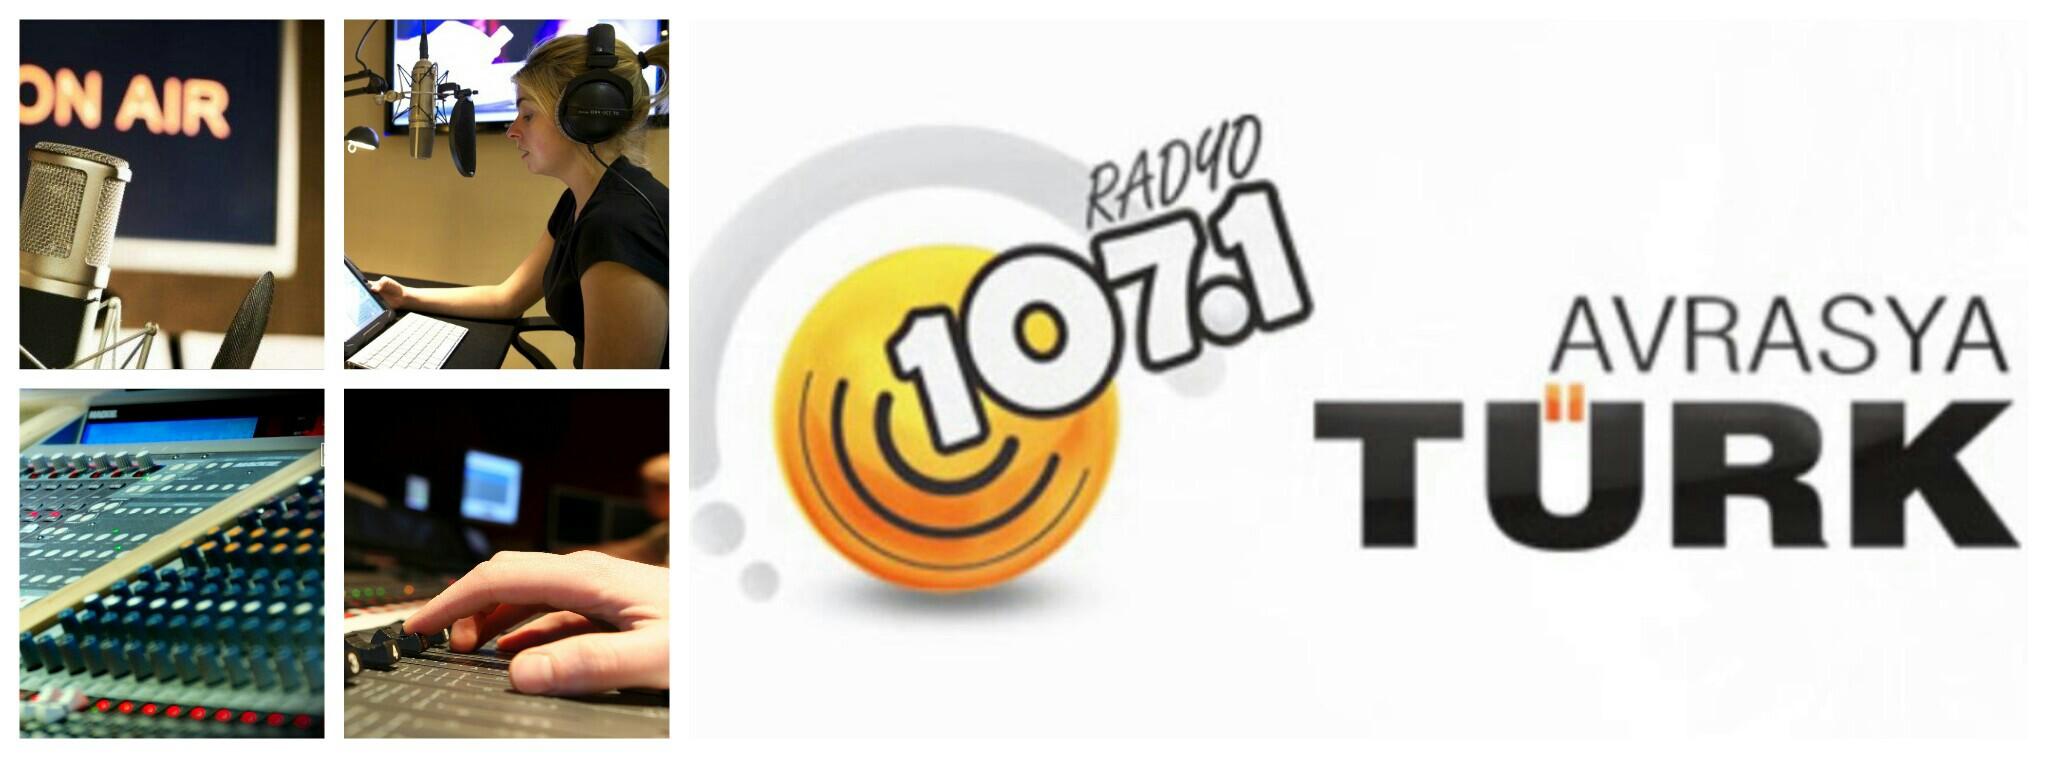 avrasyaturk_radyo